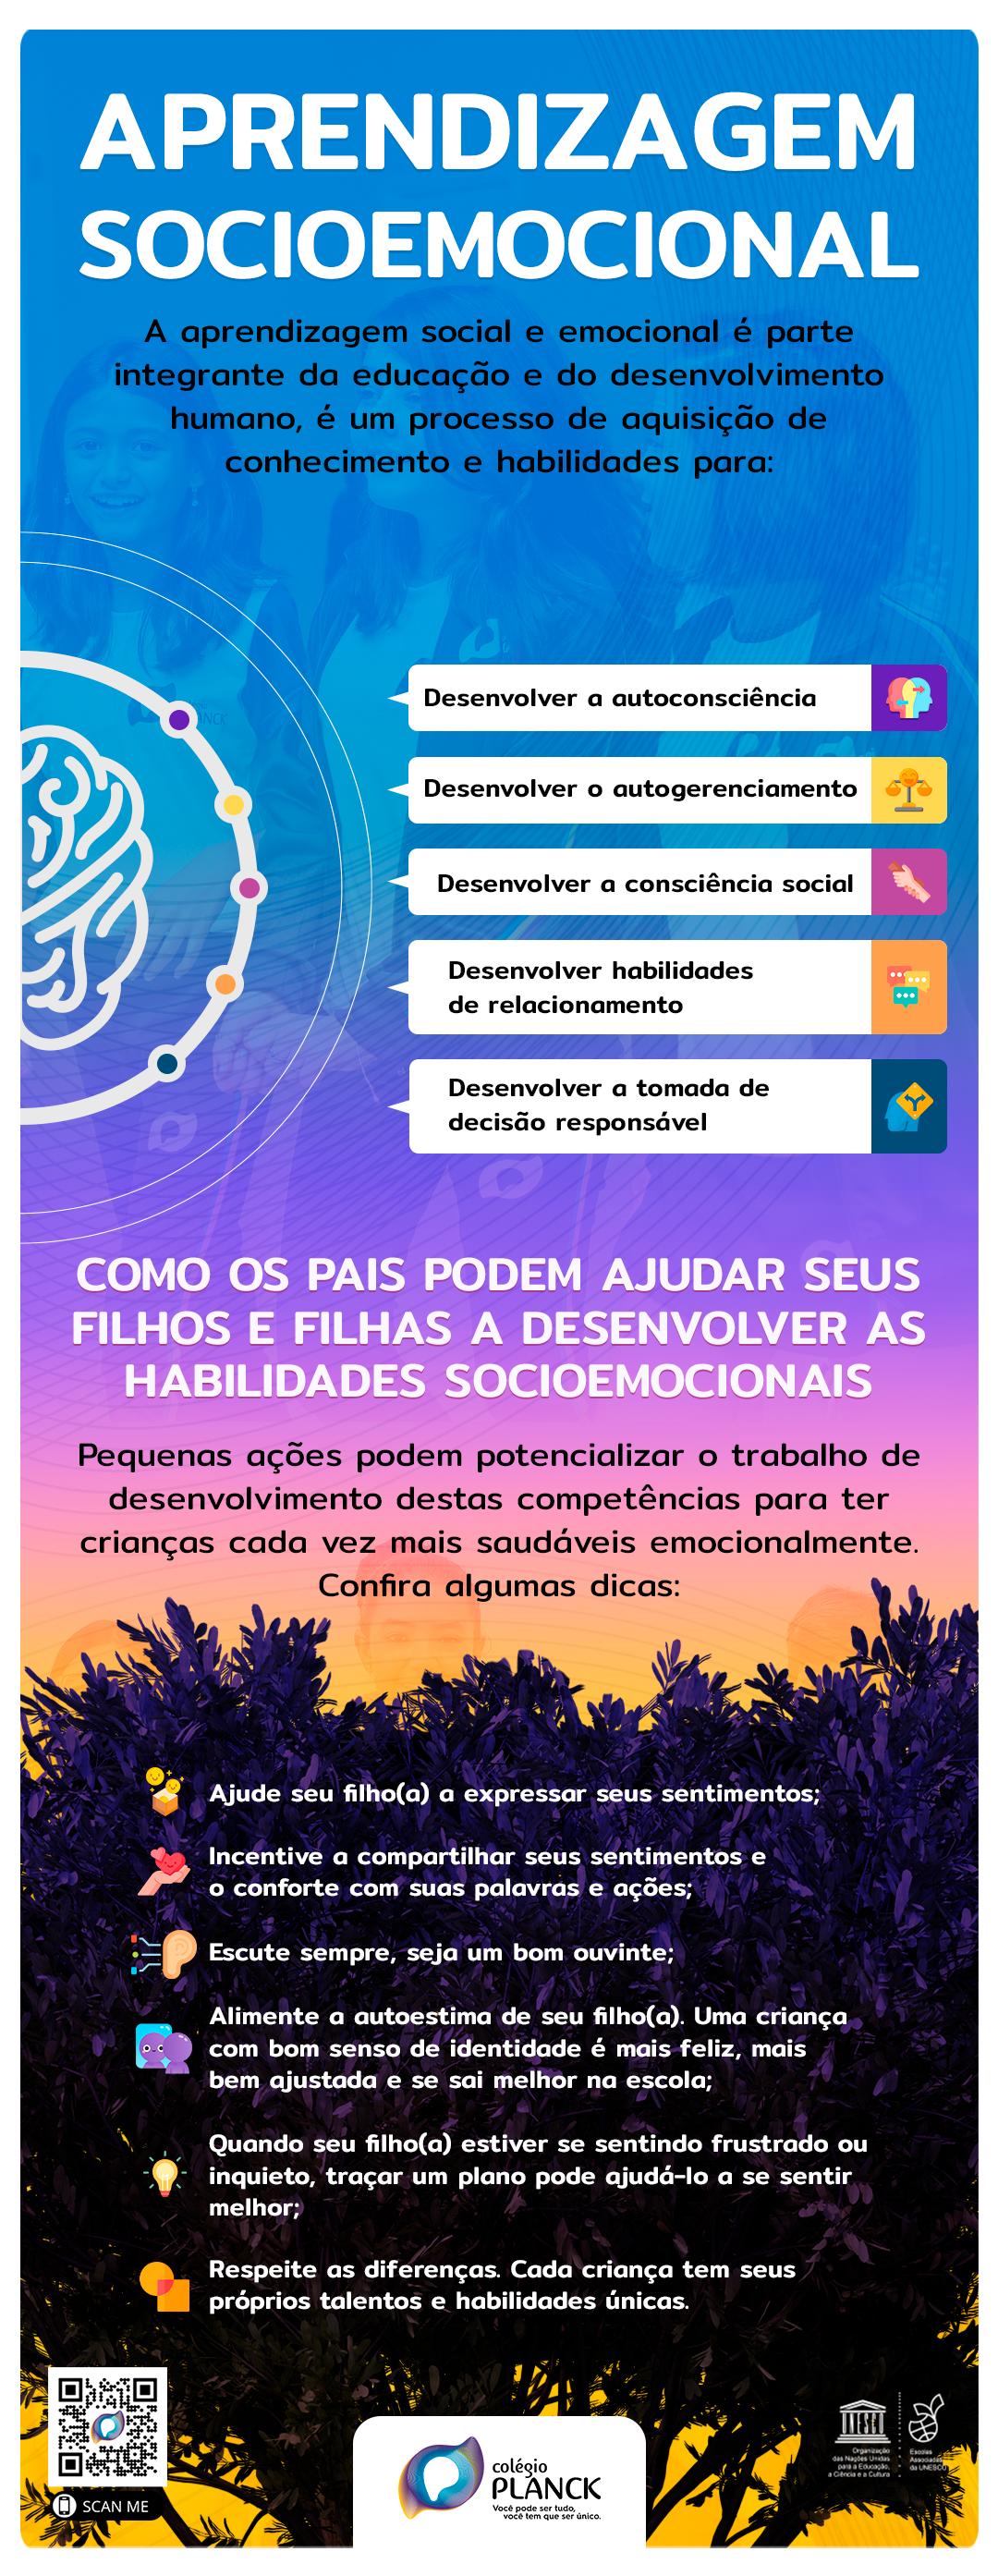 infografico-aprendizagem-socioemocional